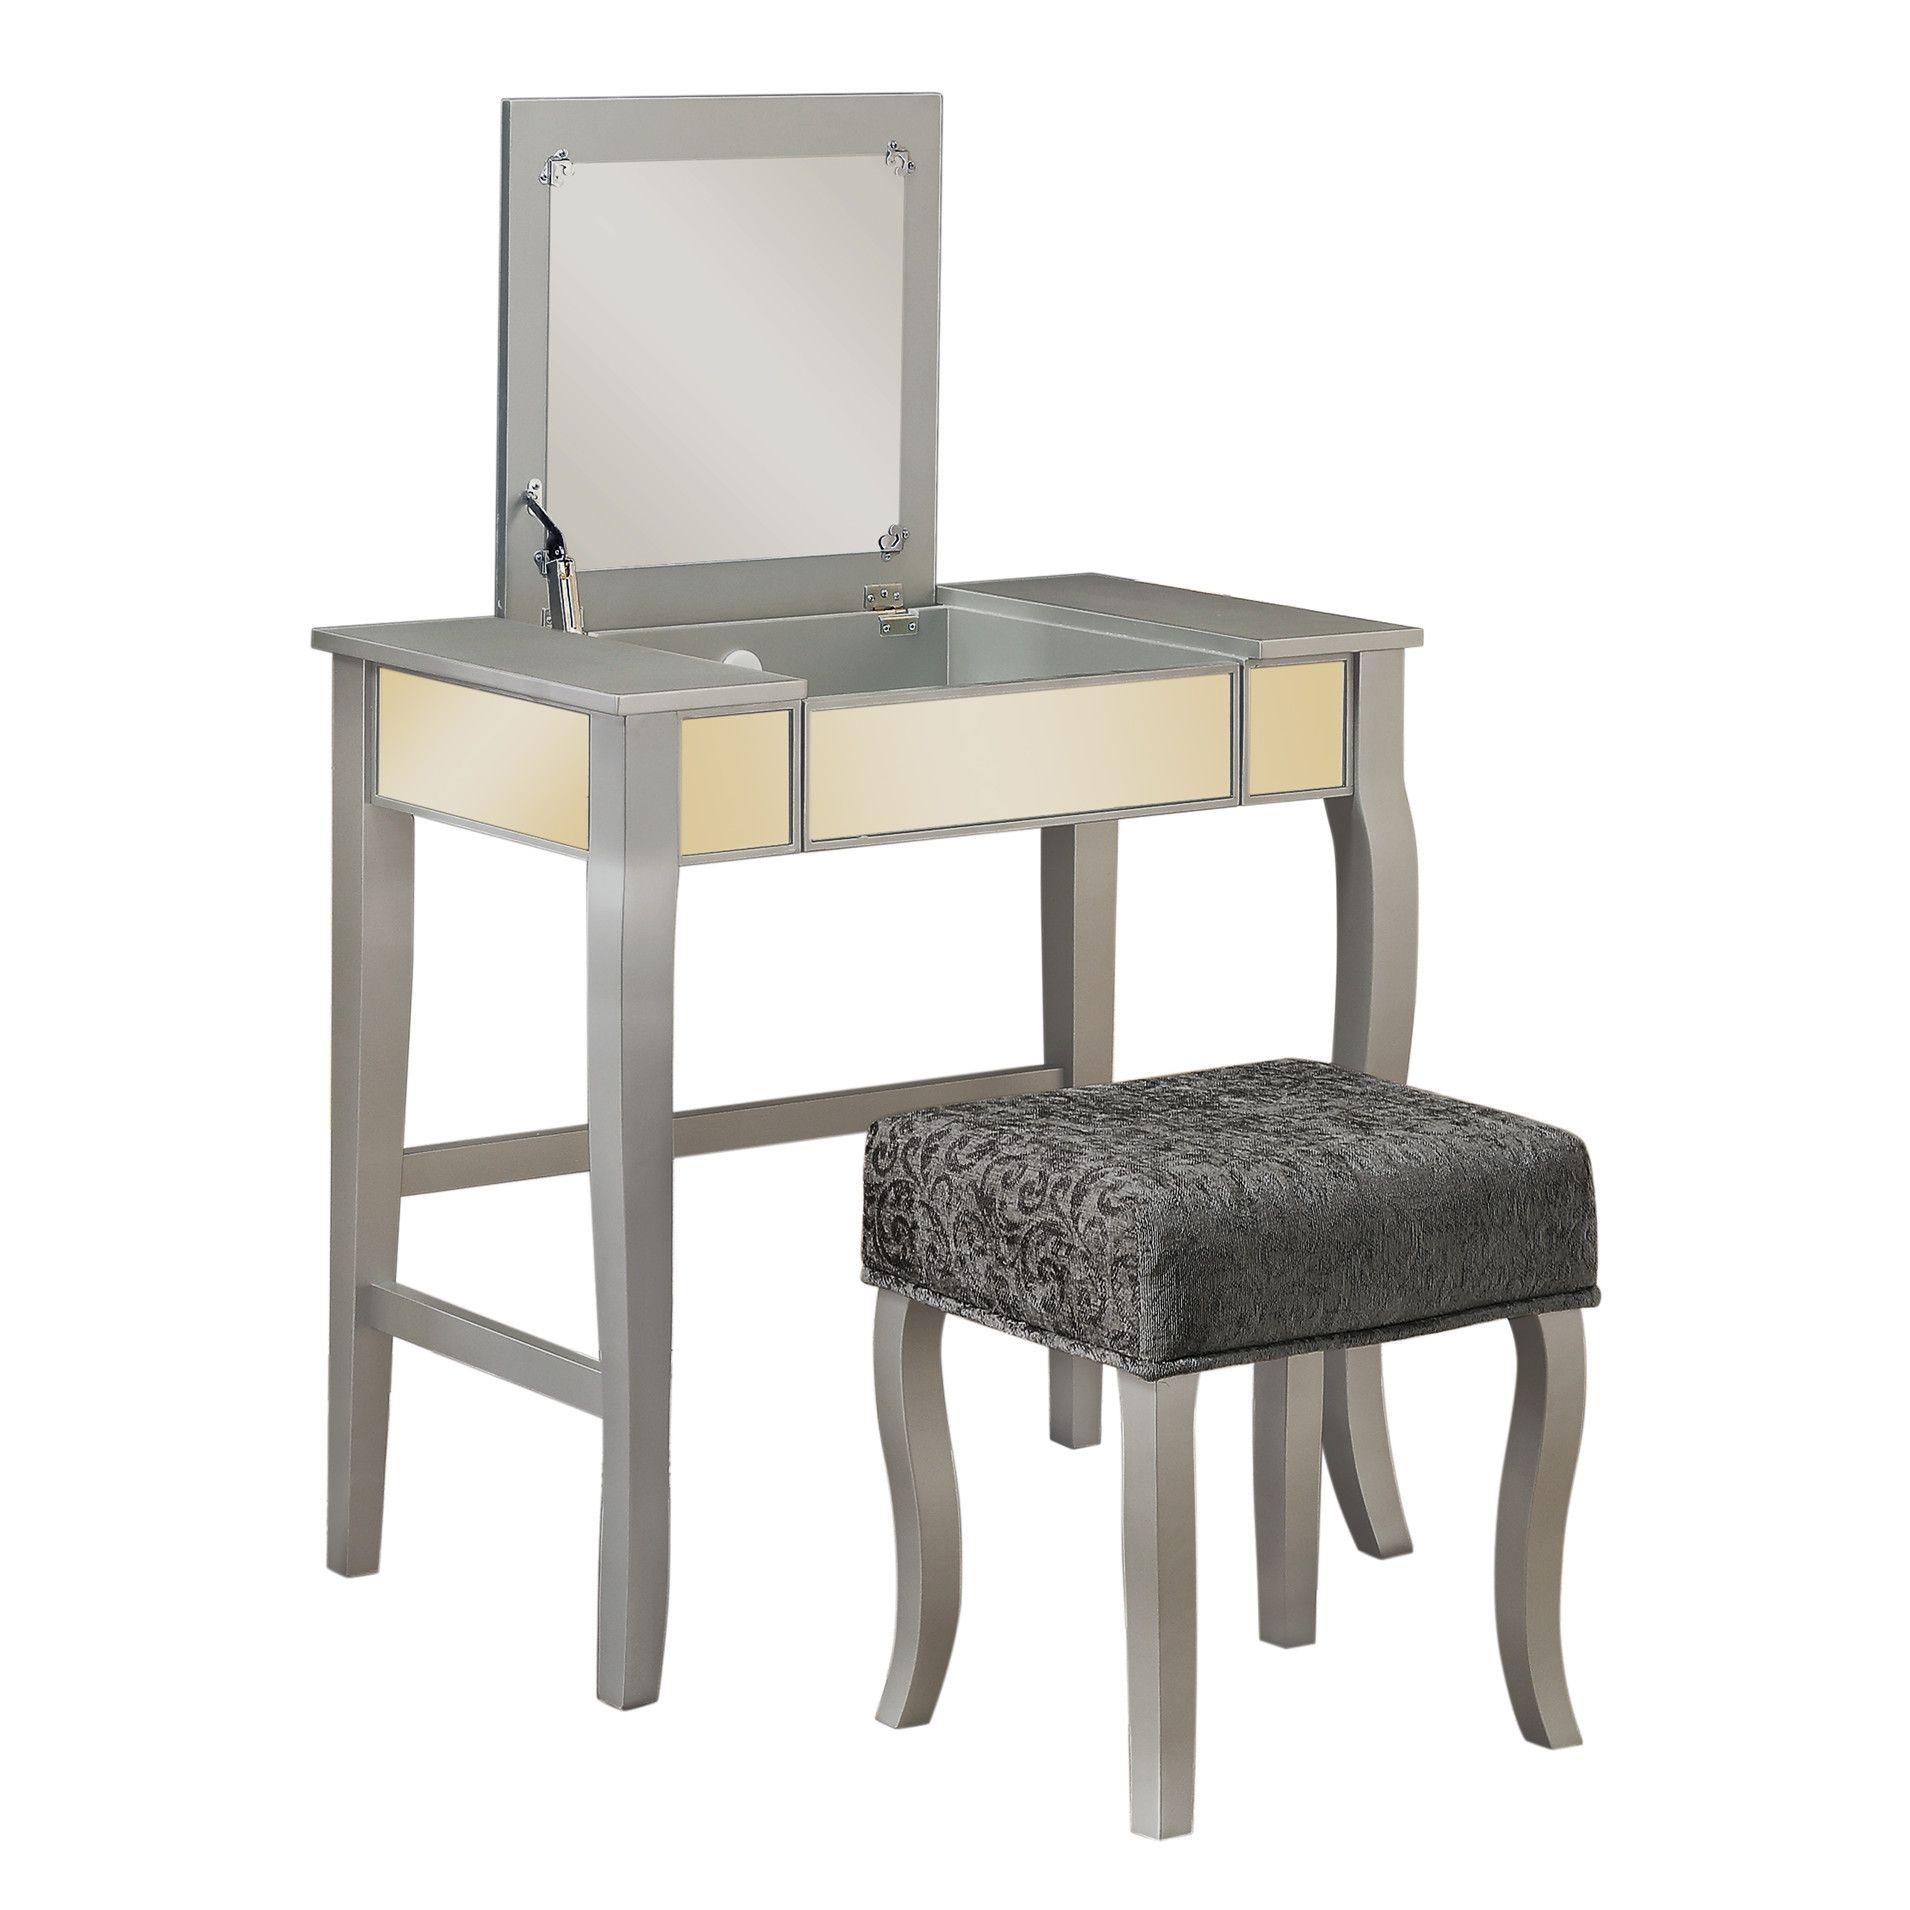 2-Piece Jolene Mirrored Vanity & Stool Set